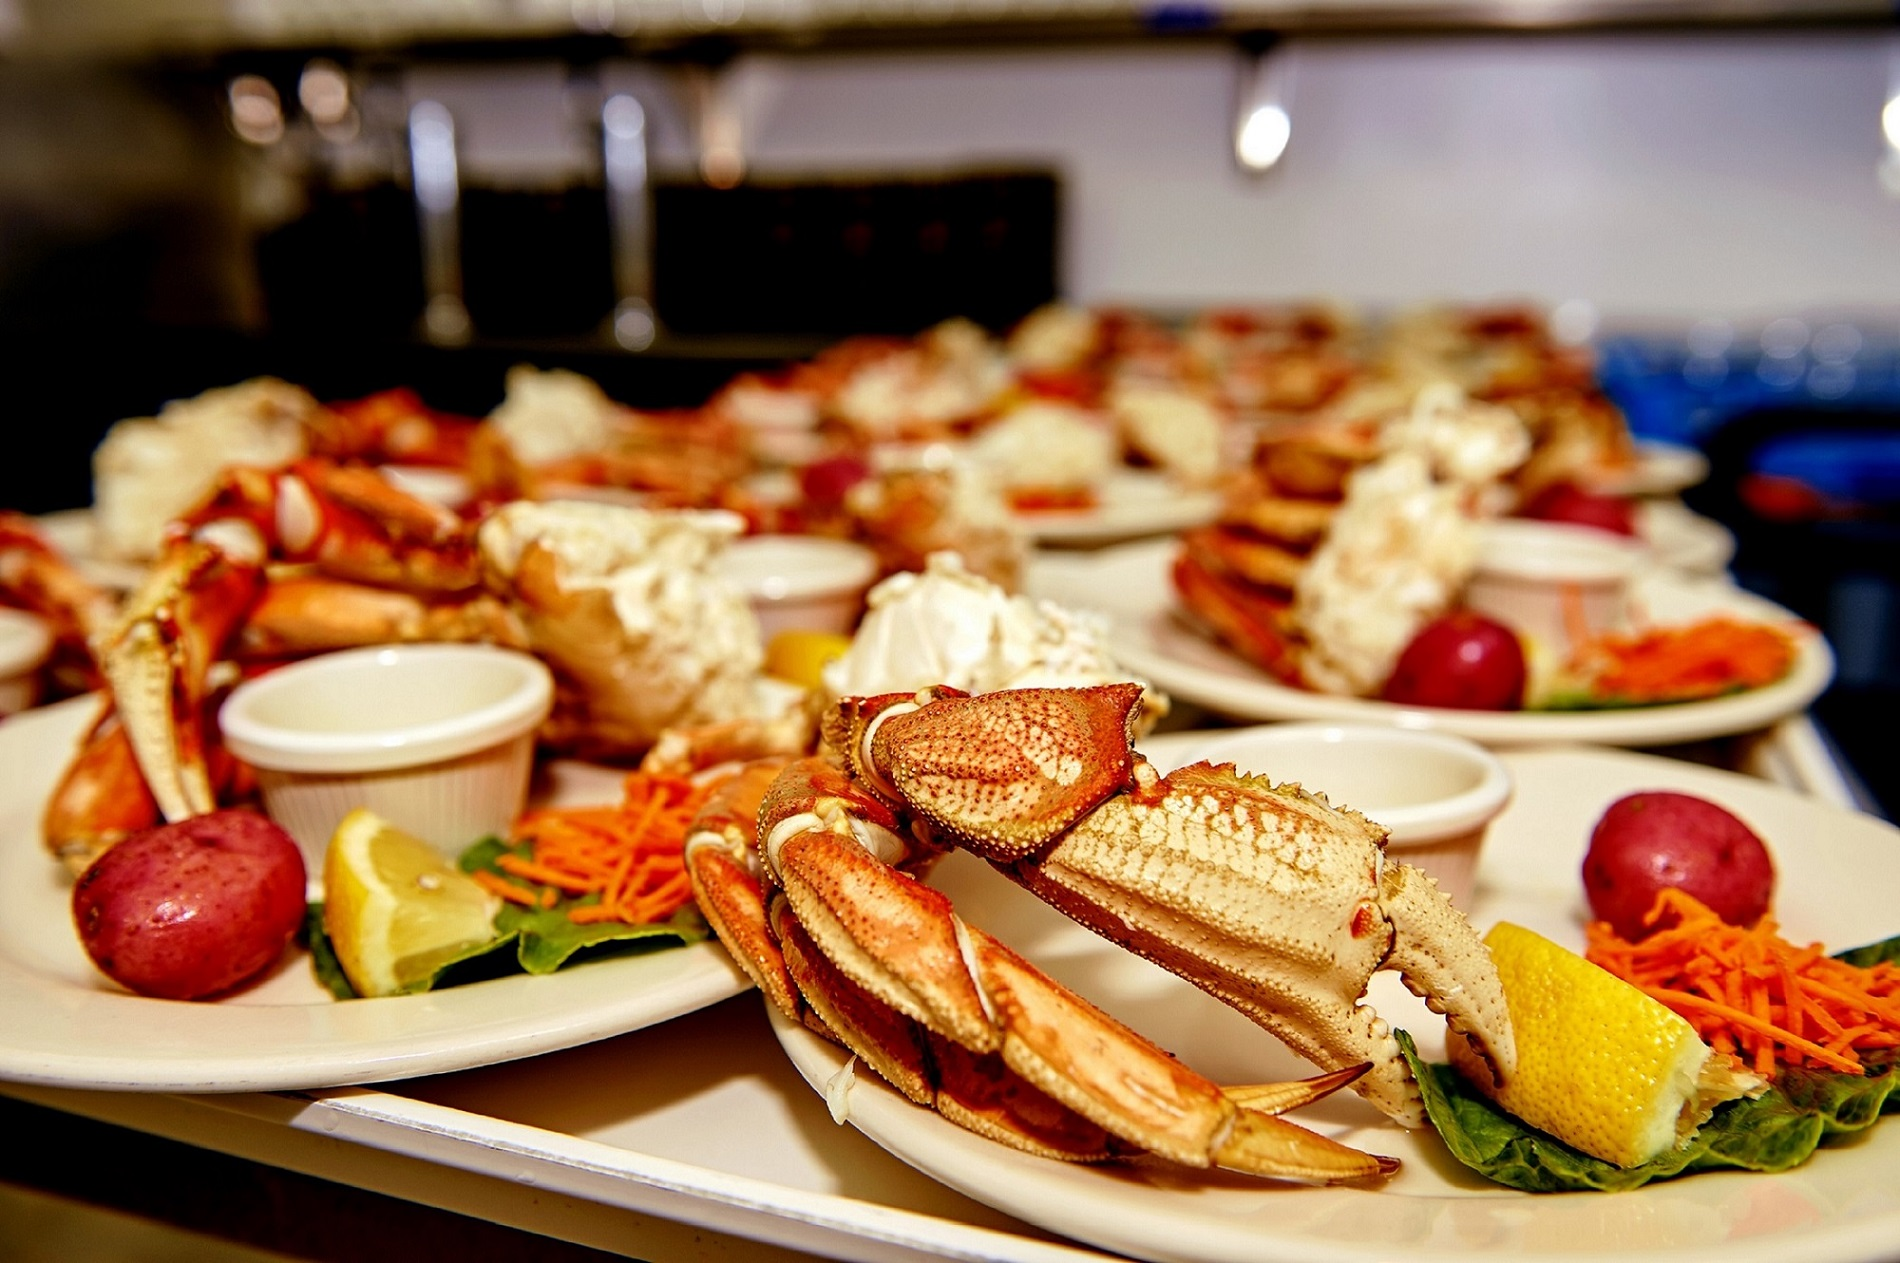 https://www.kawanti.com/wp-content/uploads/2020/02/Crab-Feast-Tray-of-Crab.jpg